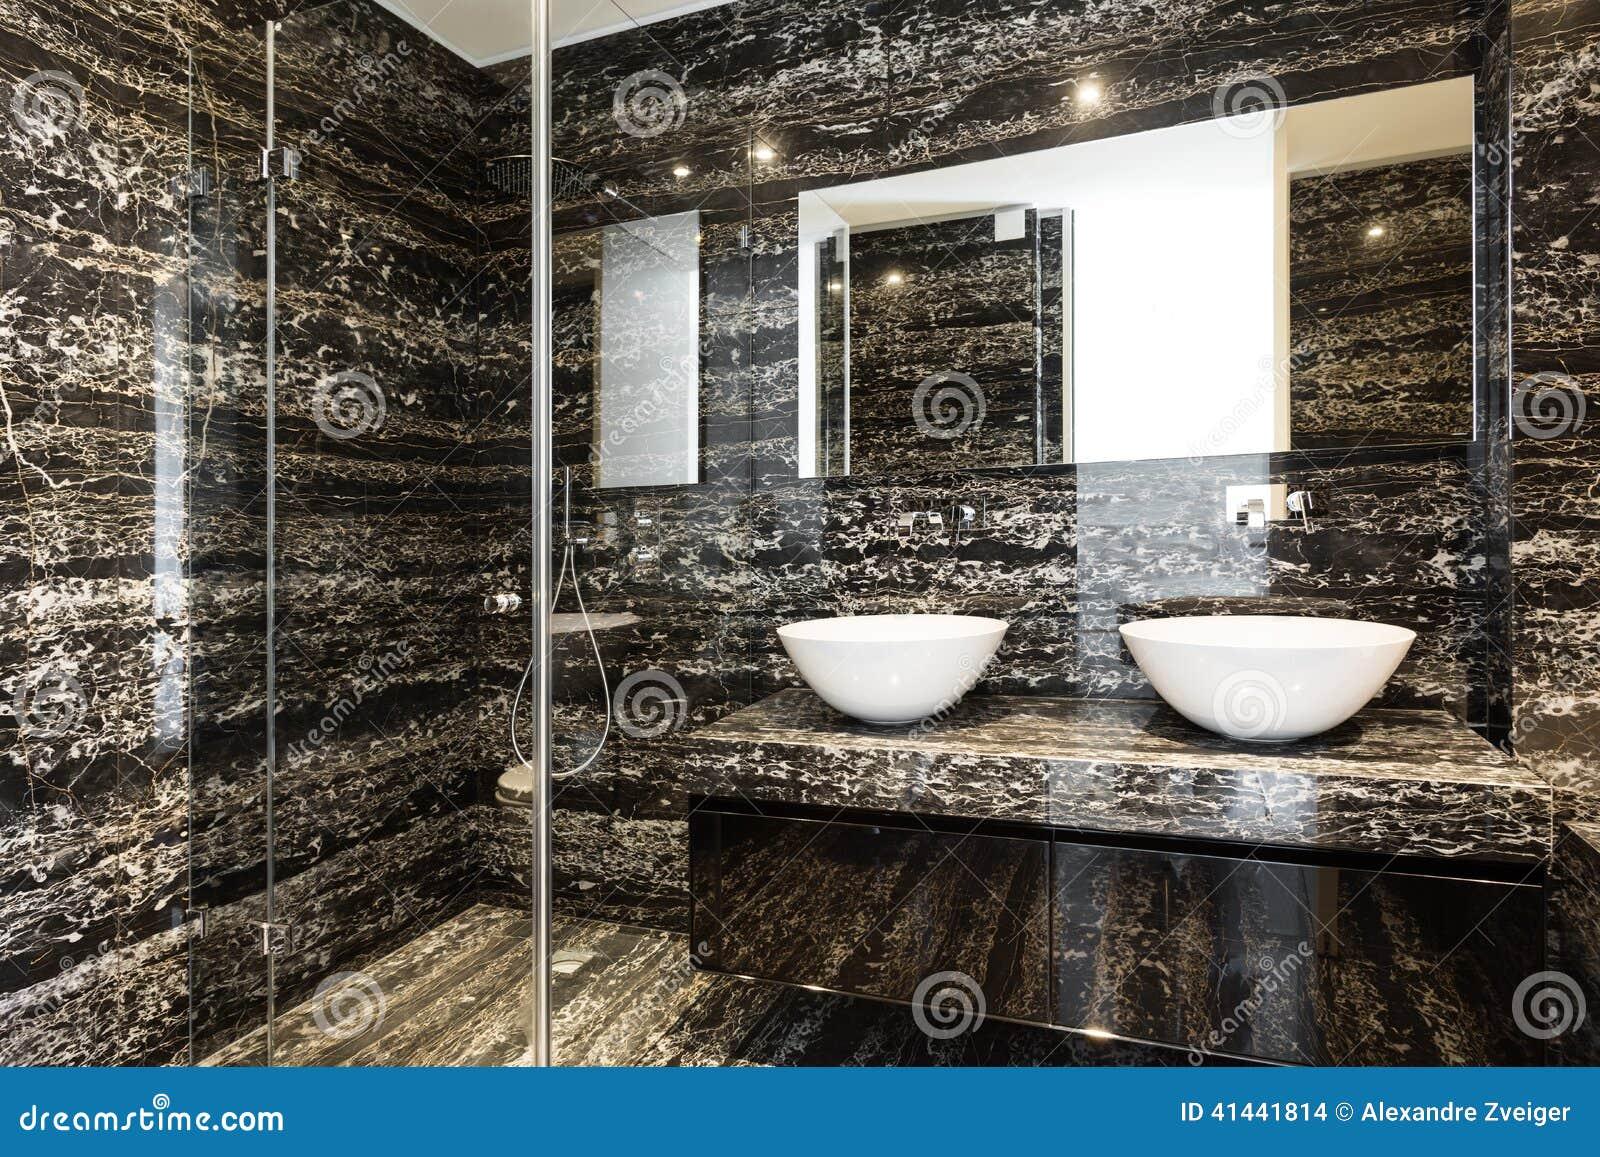 Mooie Moderne Badkamers : Mooie badkamers finest b dutch is een producent van keukens en